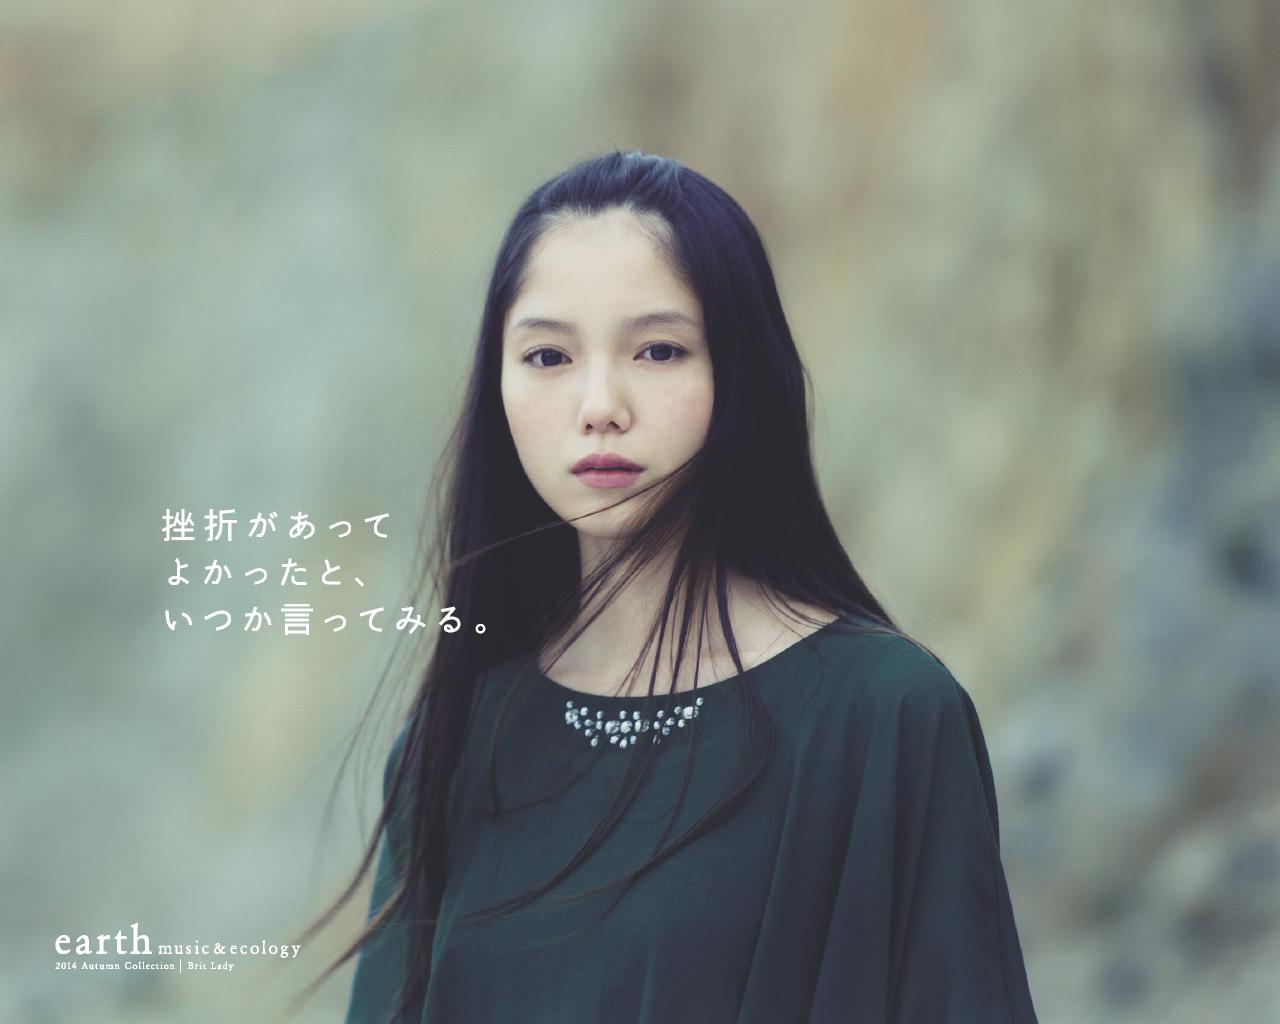 earth music&ecology広告の宮崎あおいが怖い